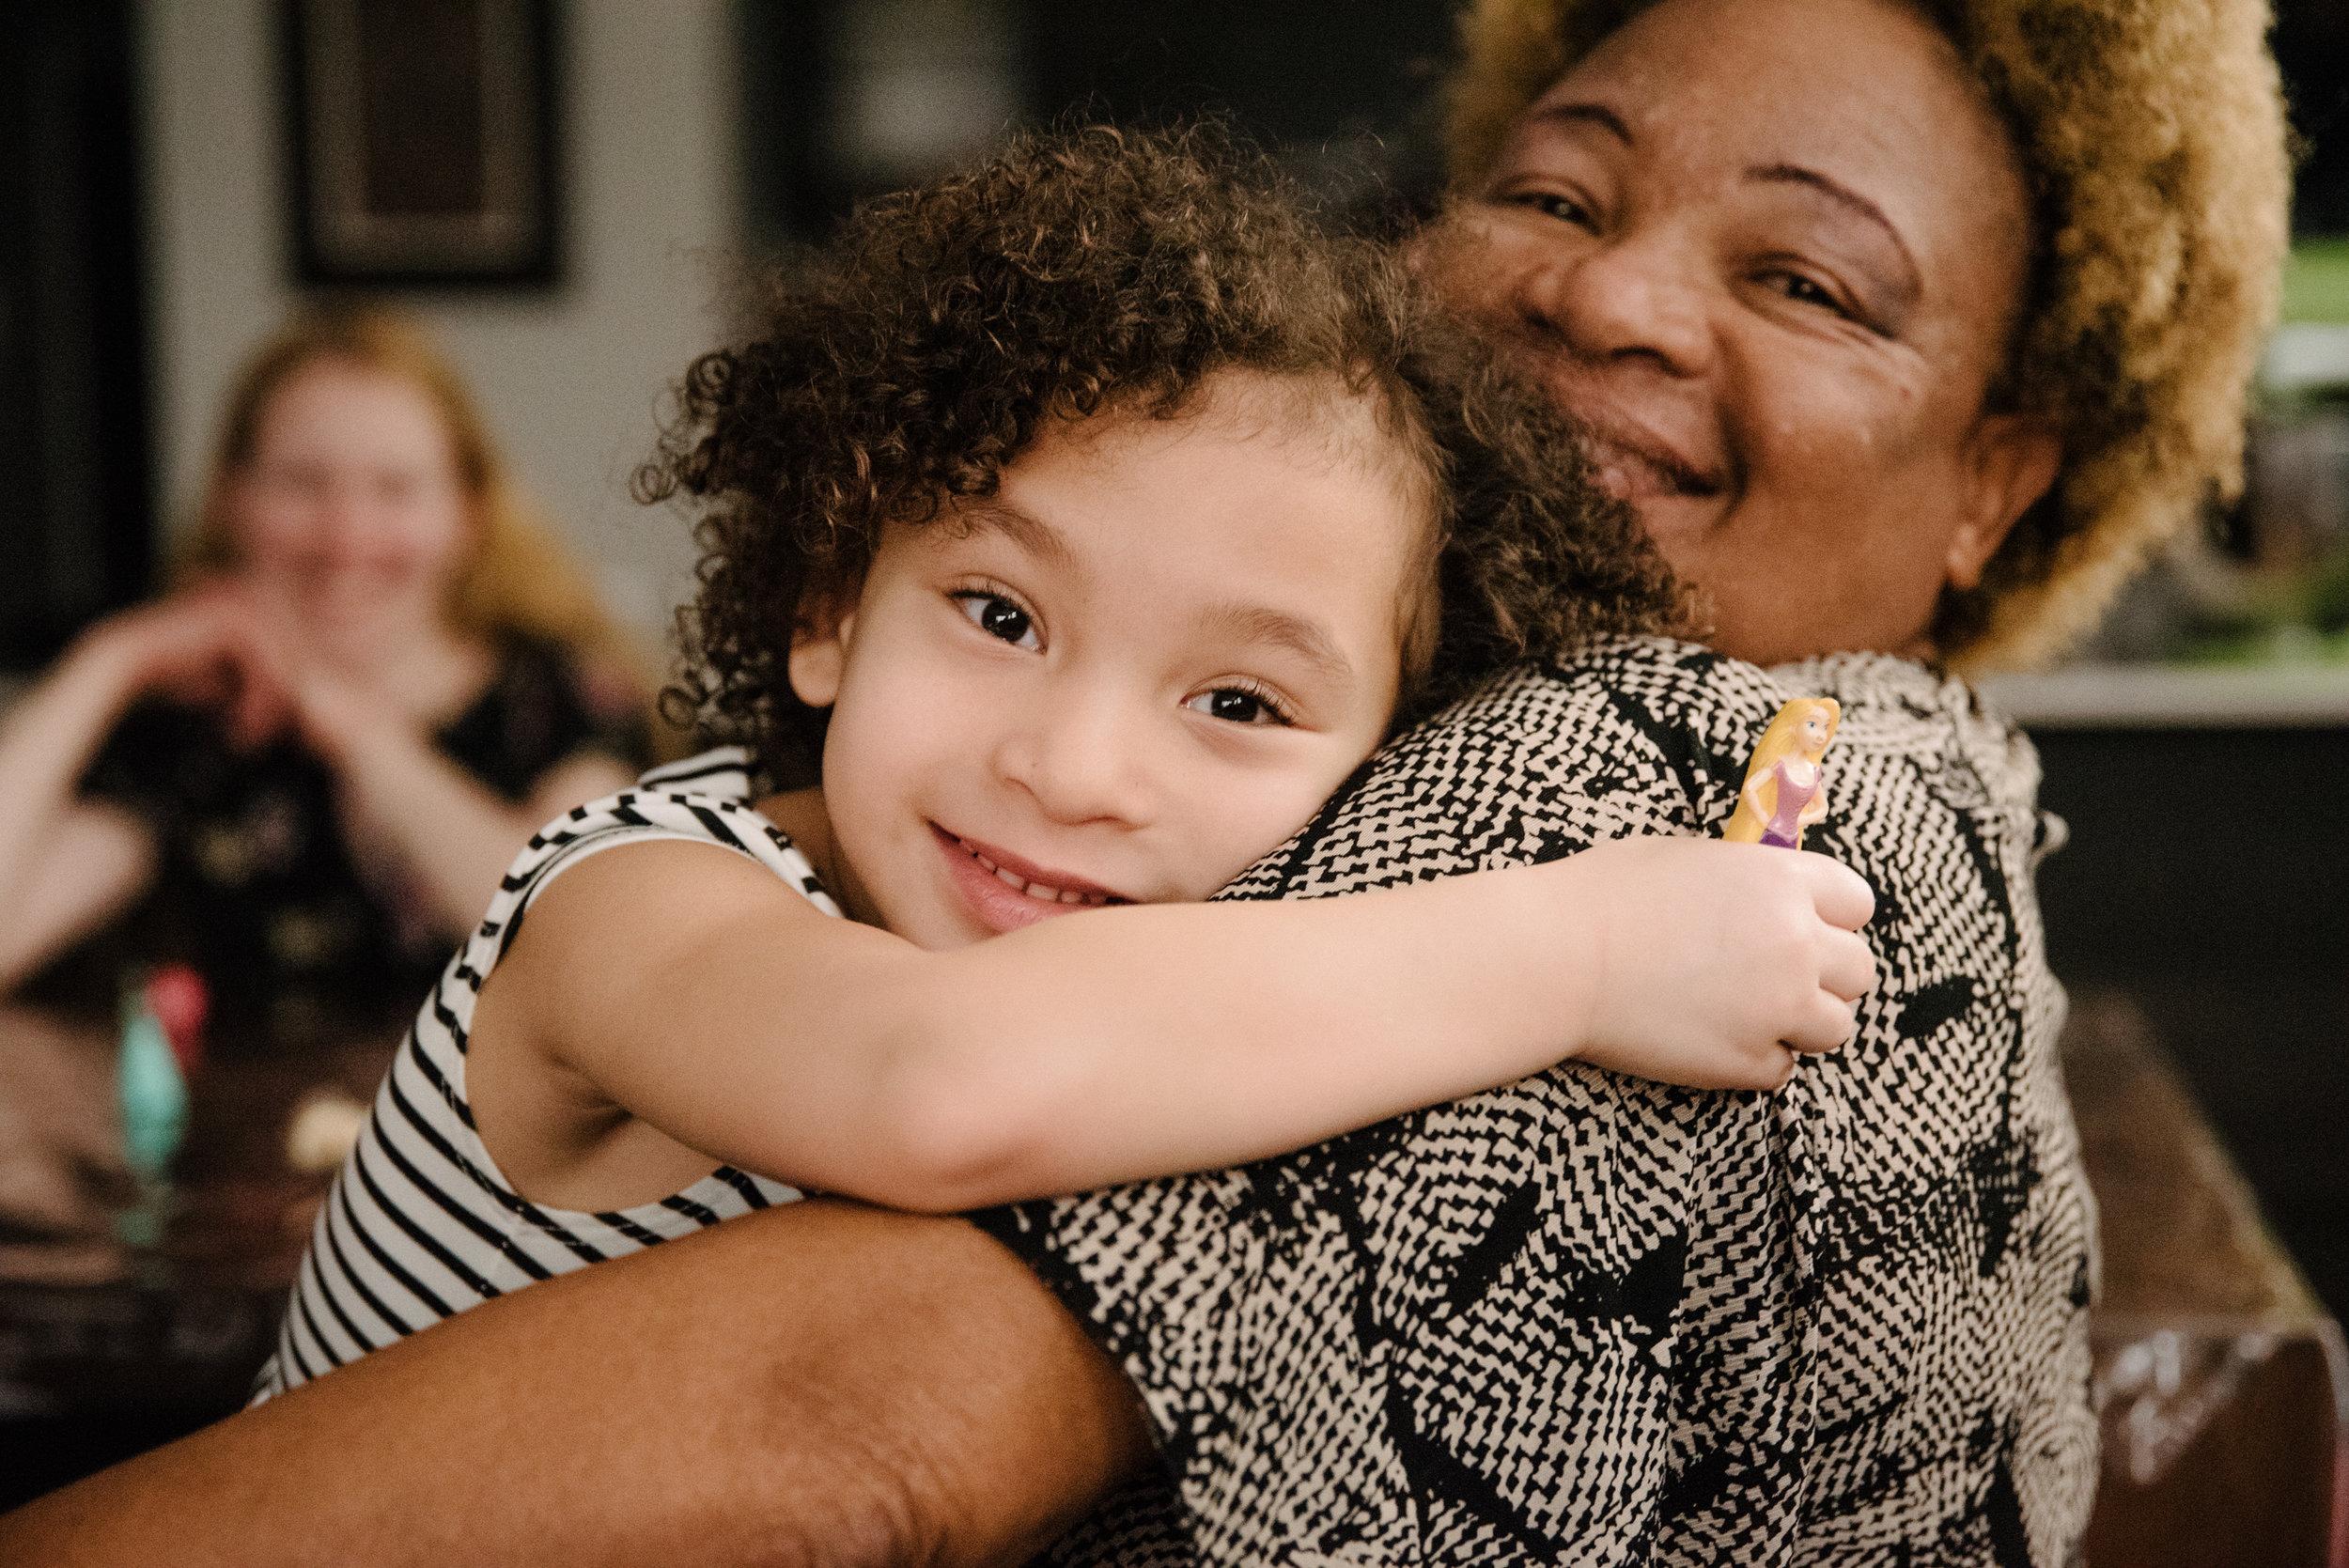 photo-dune-grand-maman-qui-prend-sa-petite-fille-dans-ses-bras-photographe-de-famille-a-montreal-marianne-charland-1143.jpg